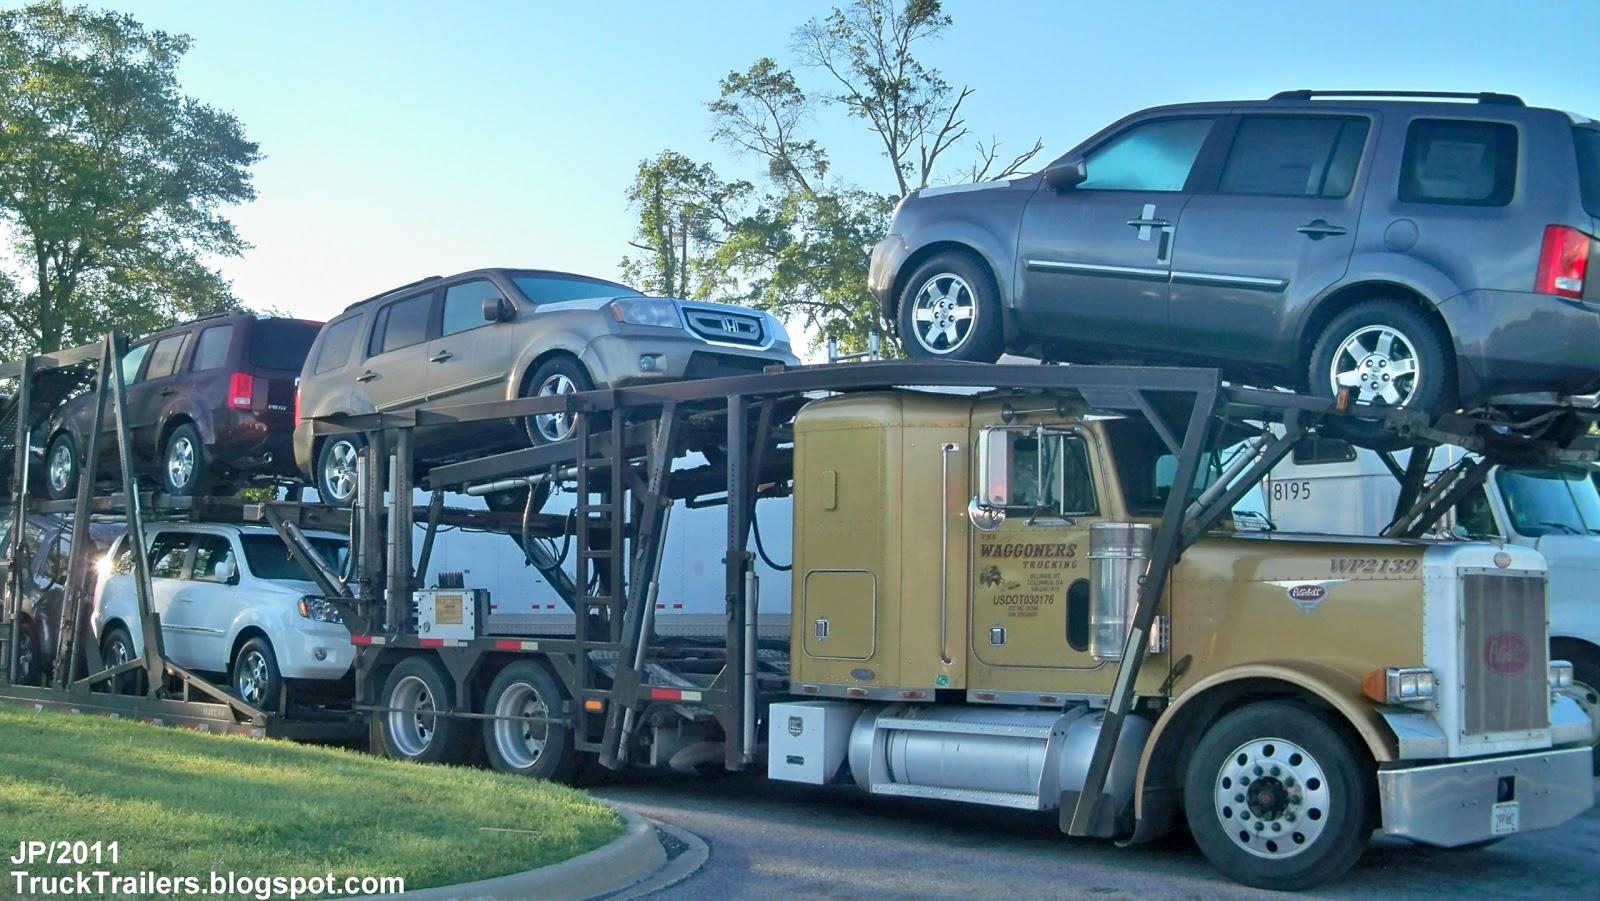 Trucks For Sale In Centurion On Truck Trailer Autos Post